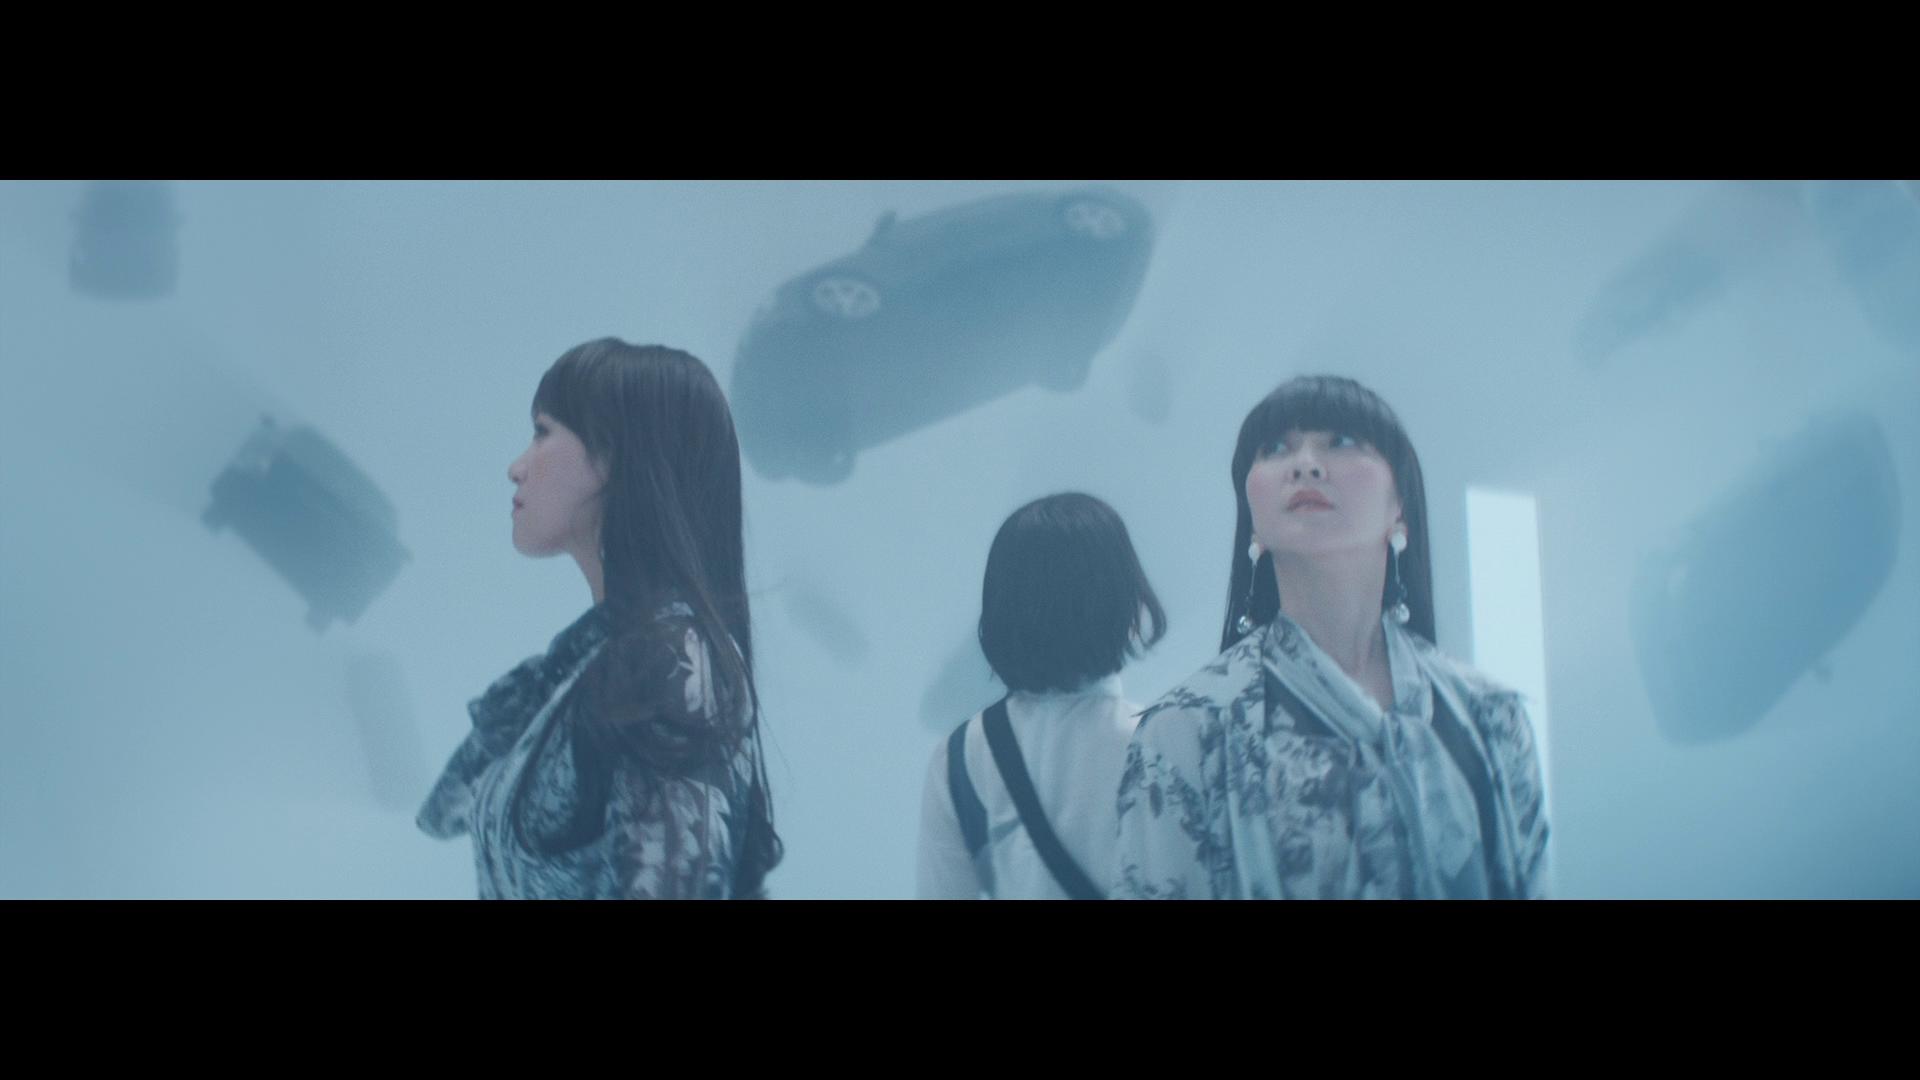 20210201.1405.1 Perfume - If you wanna (PV) (Blu-Ray) (JPOP.ru).m2ts.png